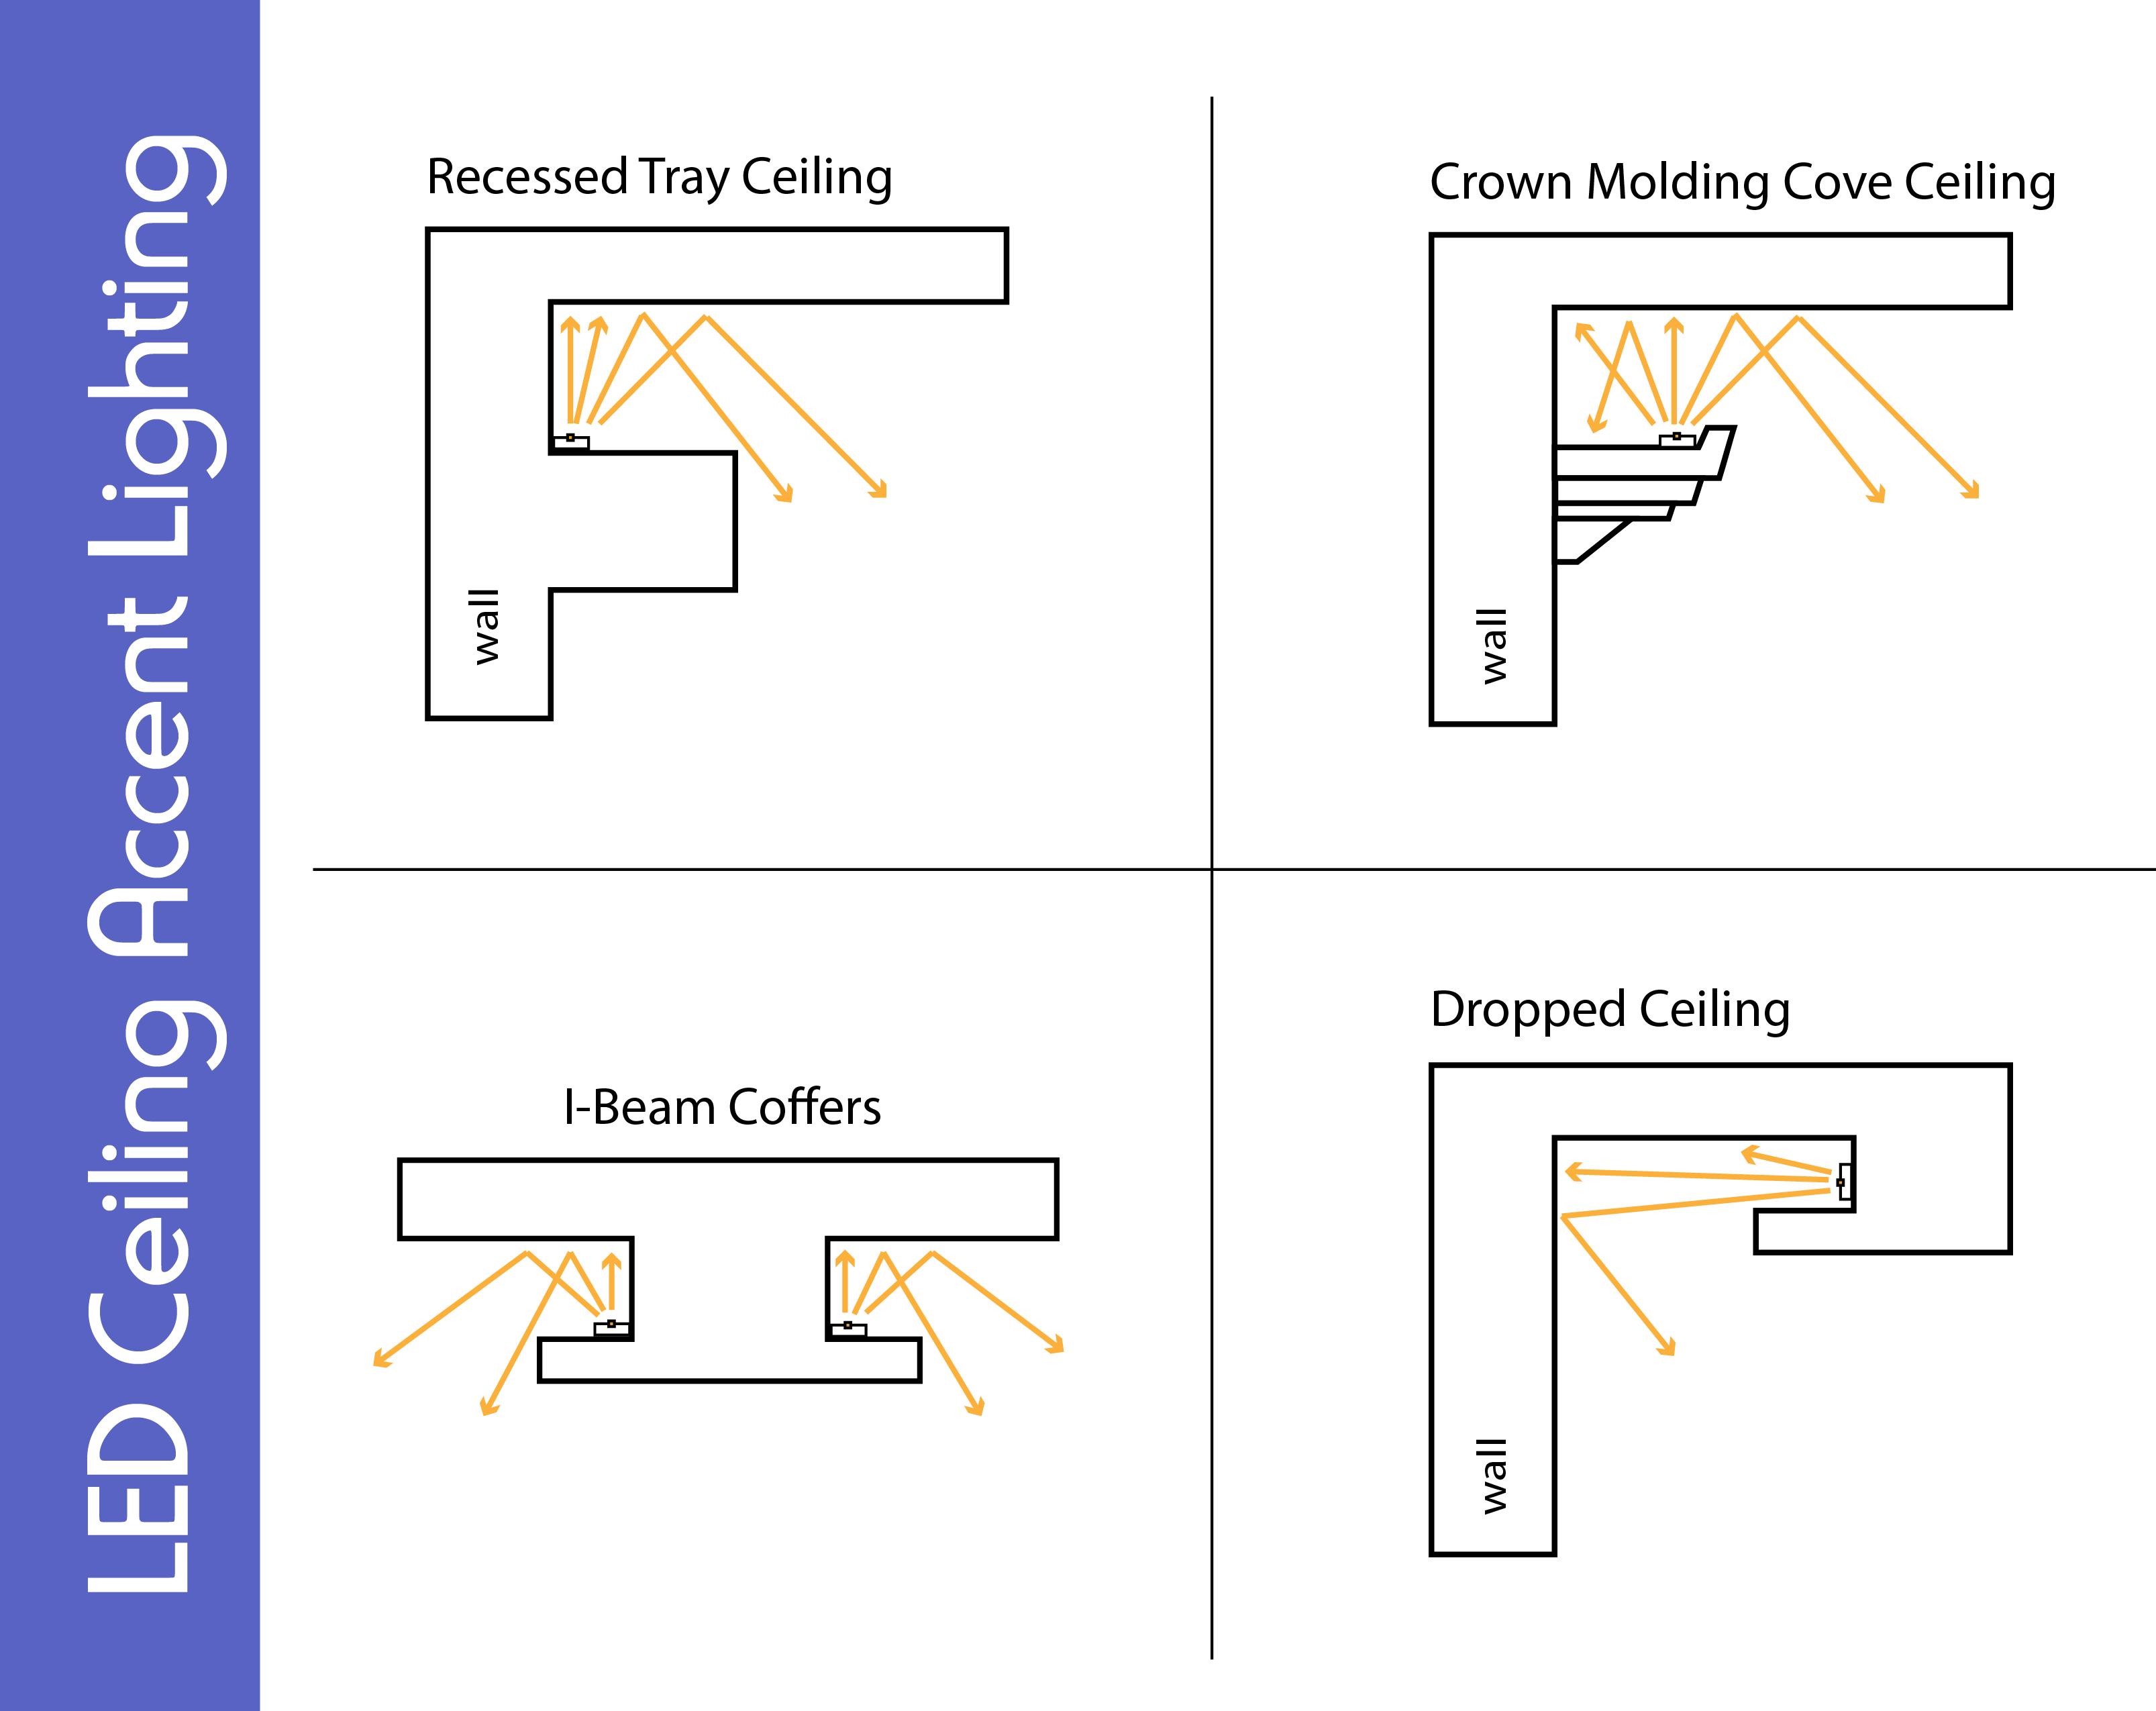 overhead led light diagram house wiring diagram symbols u2022 rh mollusksurfshopnyc com